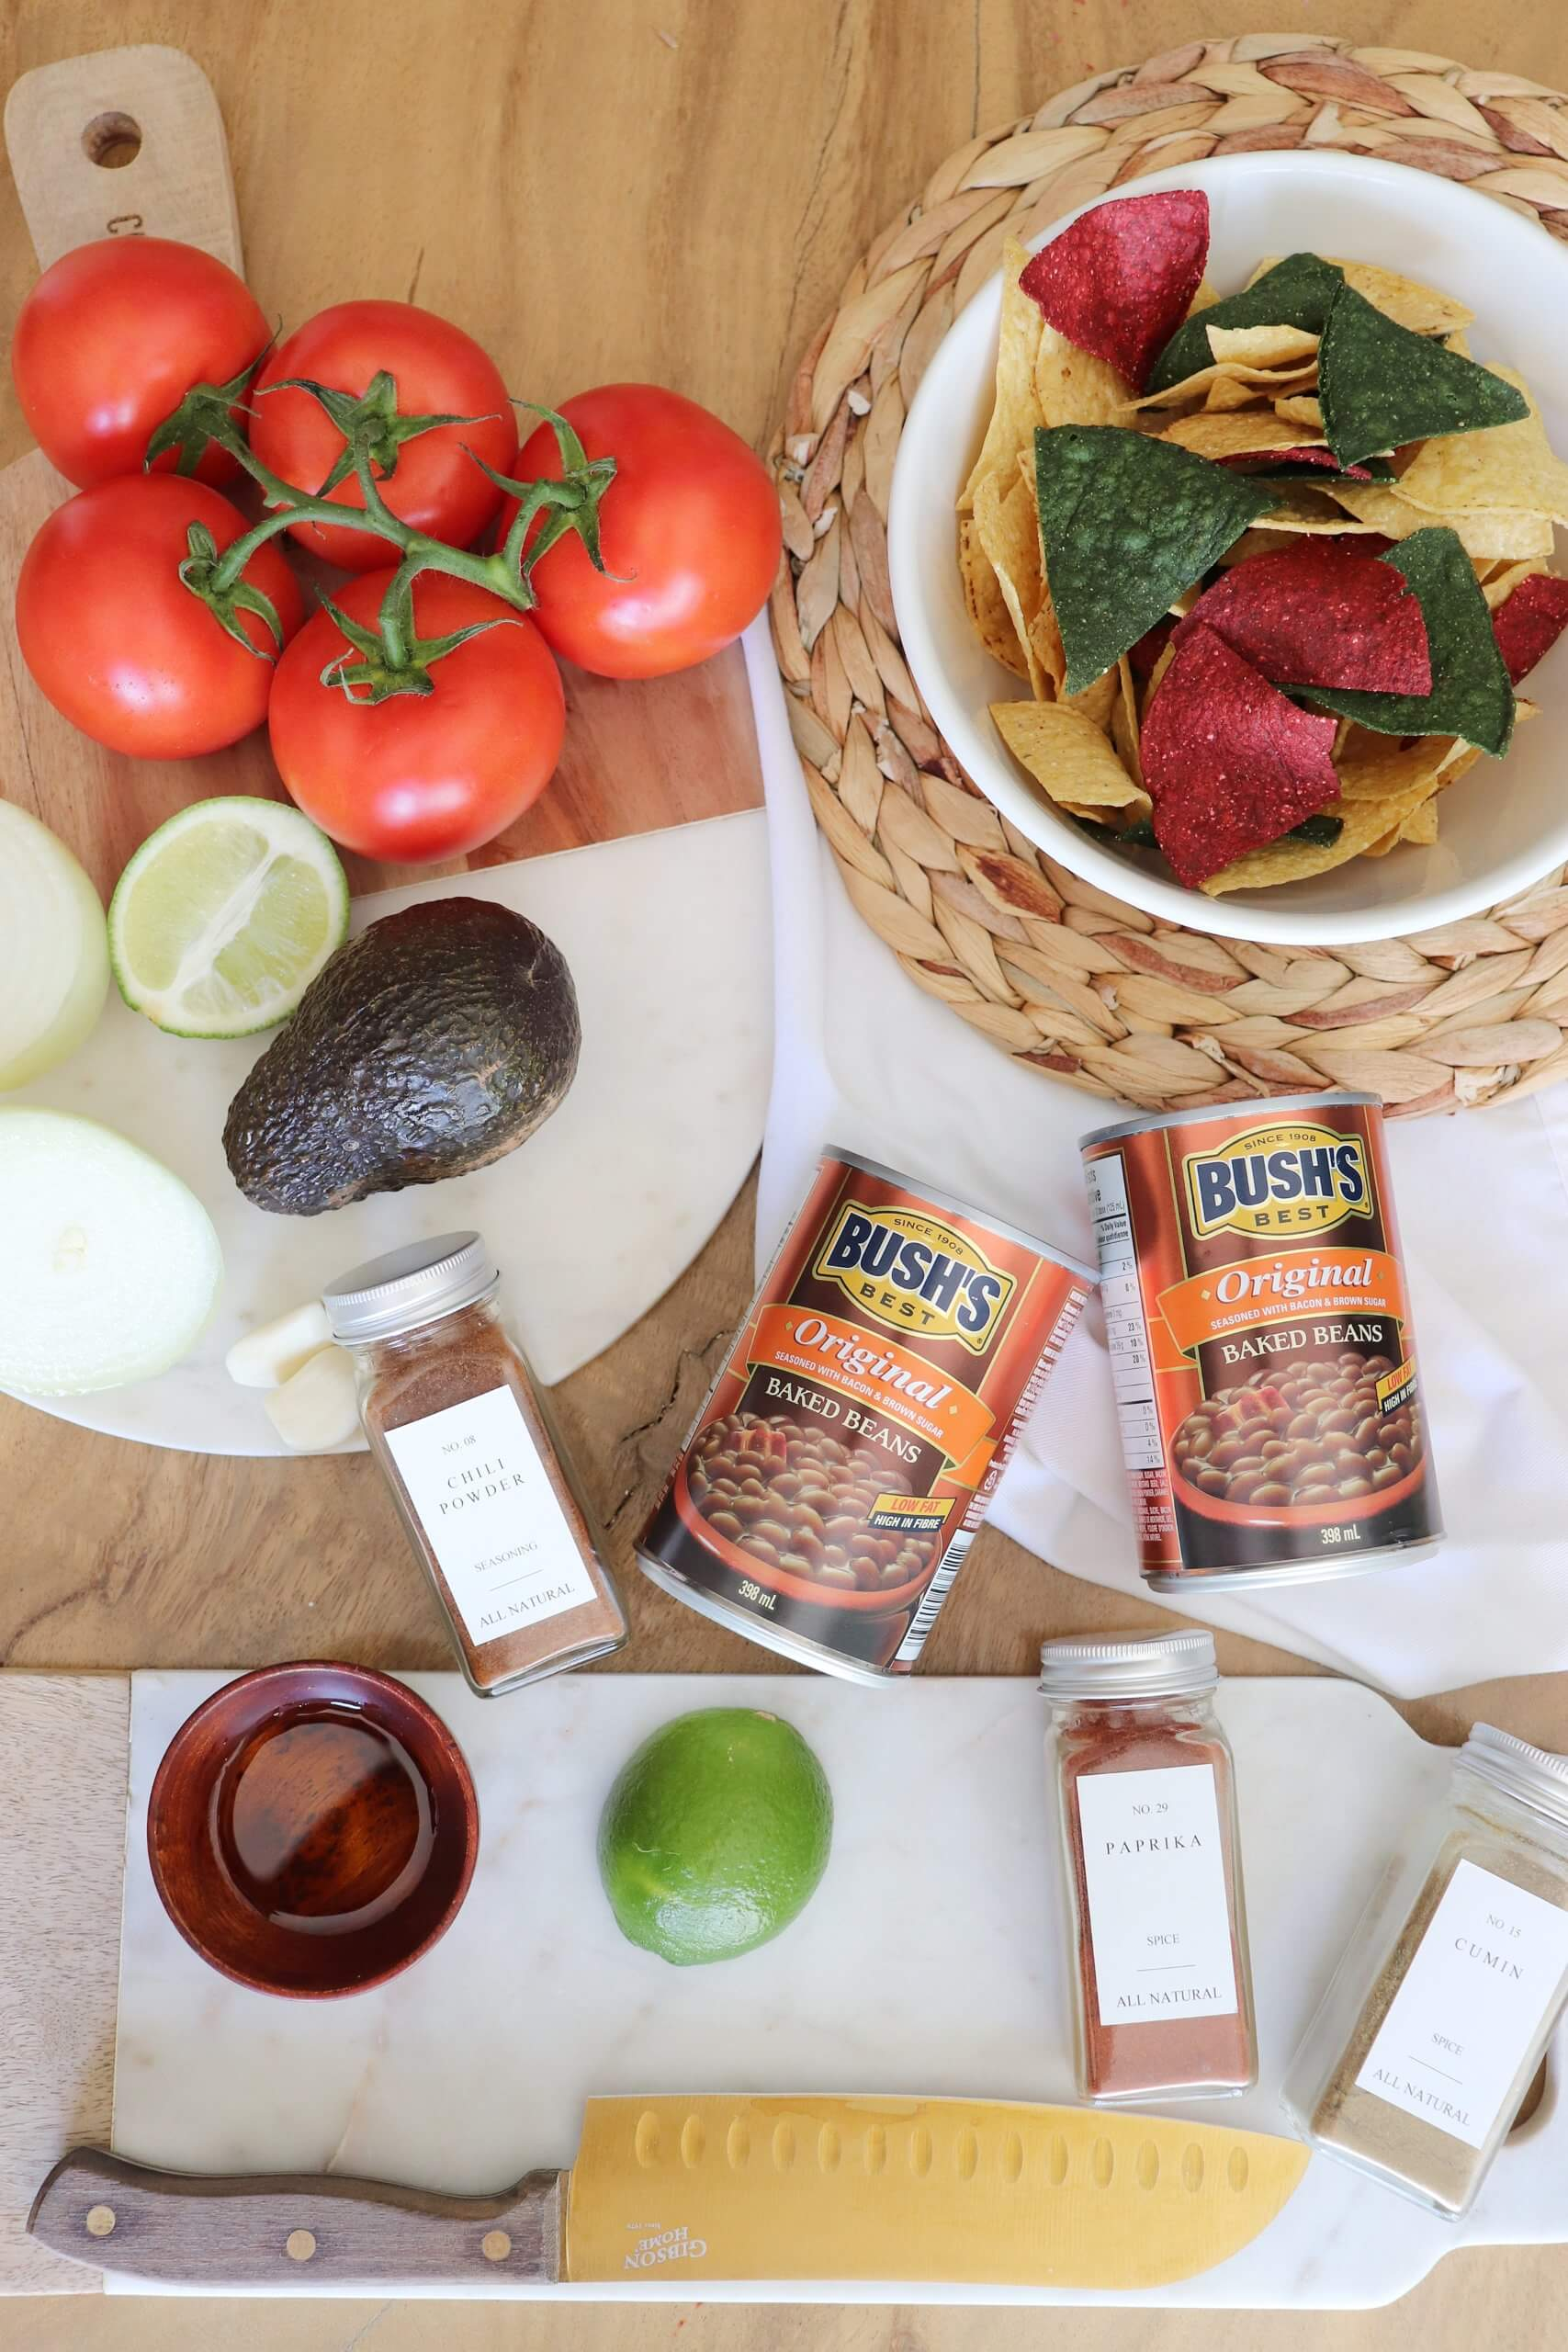 Mexican Bean Bake Starring Bush's® Original Baked Beans!